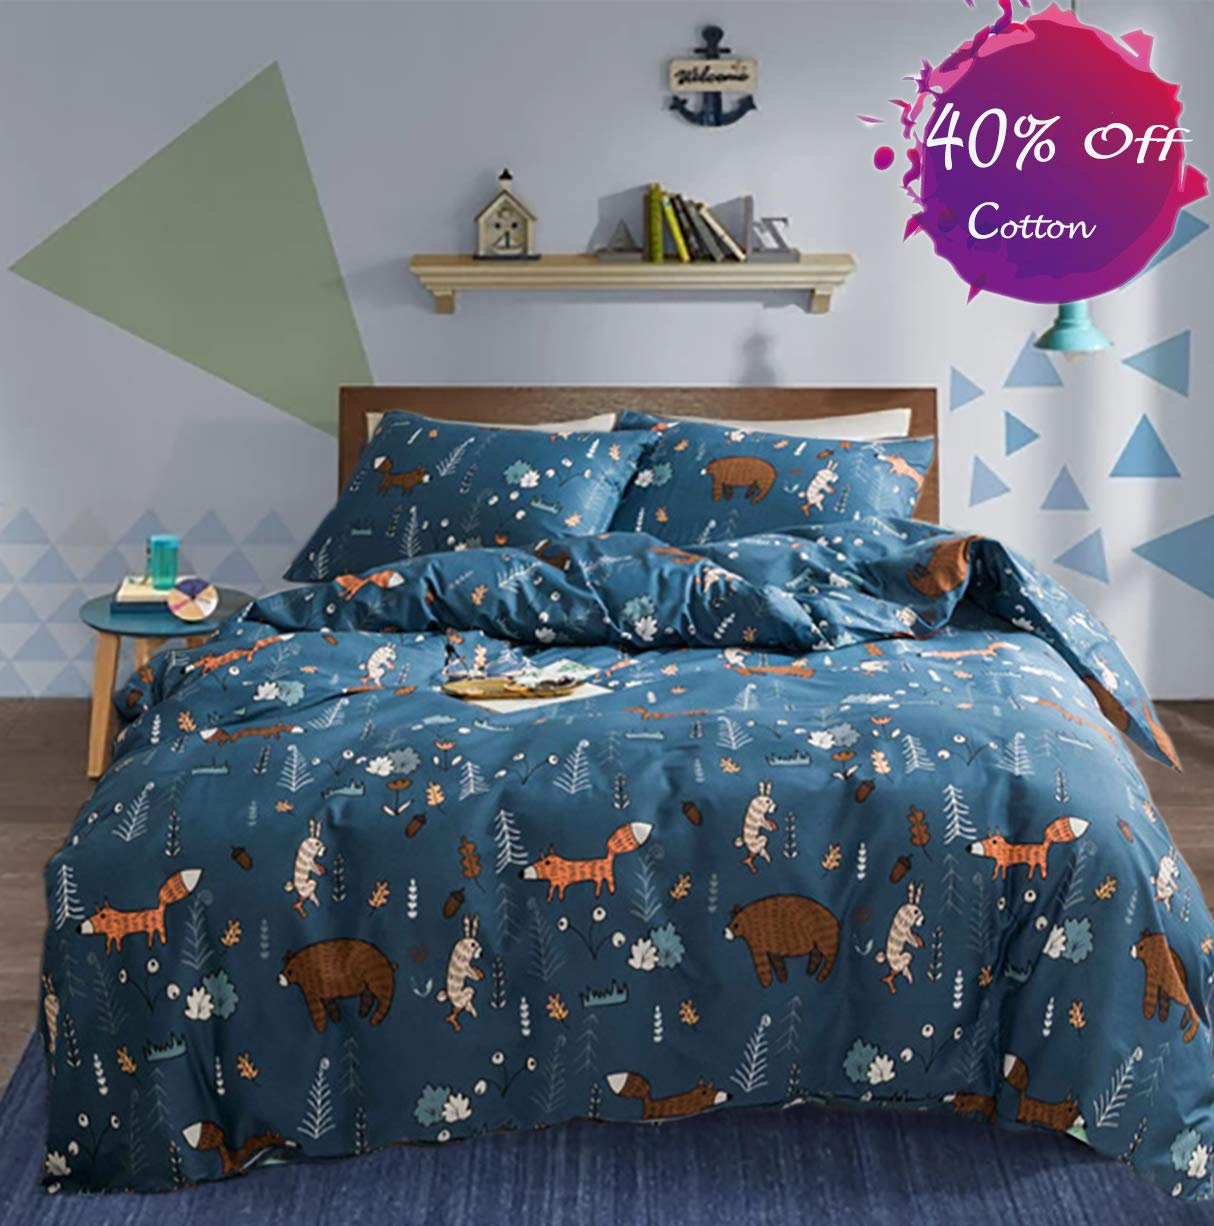 karever Cartoon Kids Duvet Cover Sets Queen Cotton Animal Forest Theme Bedding Set Full Bear Rabbit Plant Woodland Pattern Printed on Navy Blue Comforter Cover Set for Boys Girls